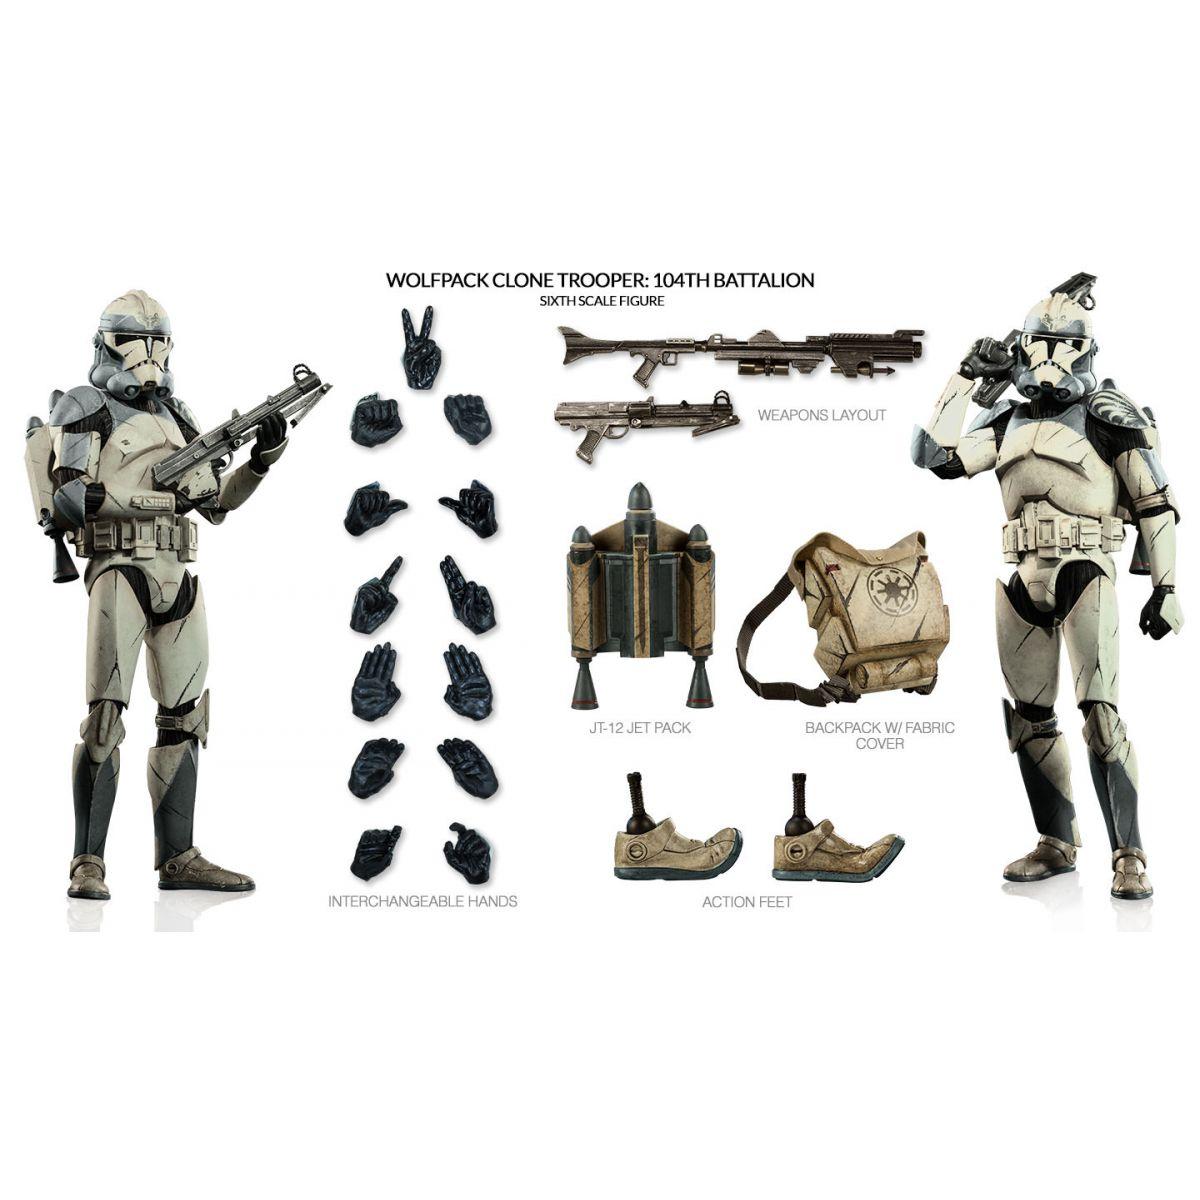 Clone Trooper Wolfpack Star Wars 104Th Escala 1:6 - Sideshow